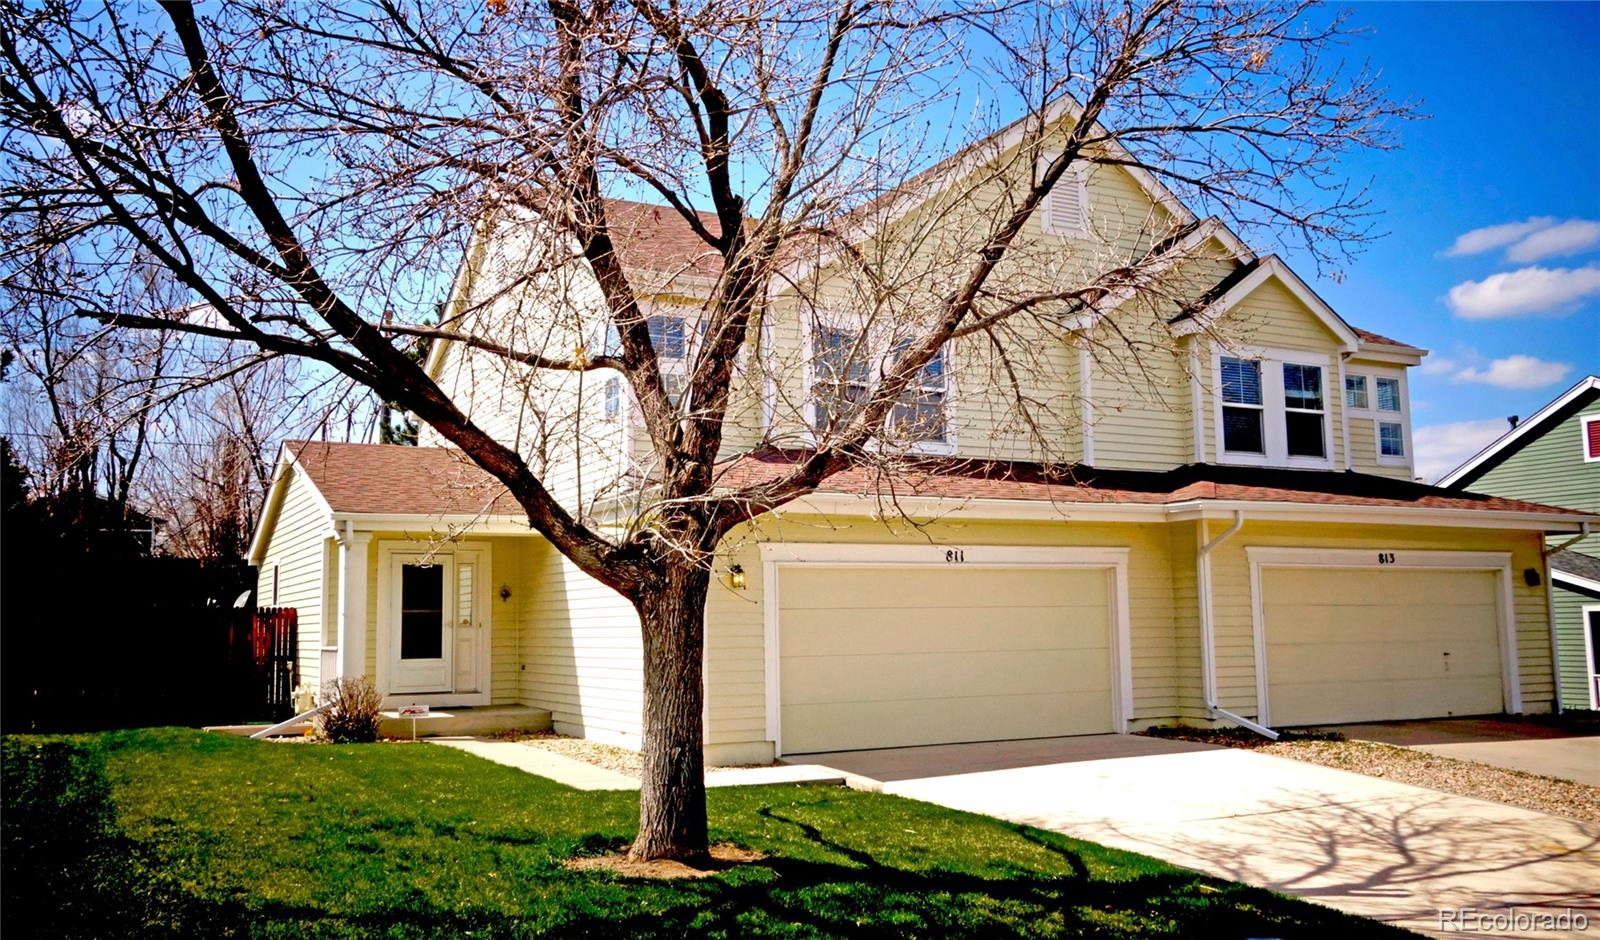 811 Union Street, Lakewood, CO 80401 - Lakewood, CO real estate listing